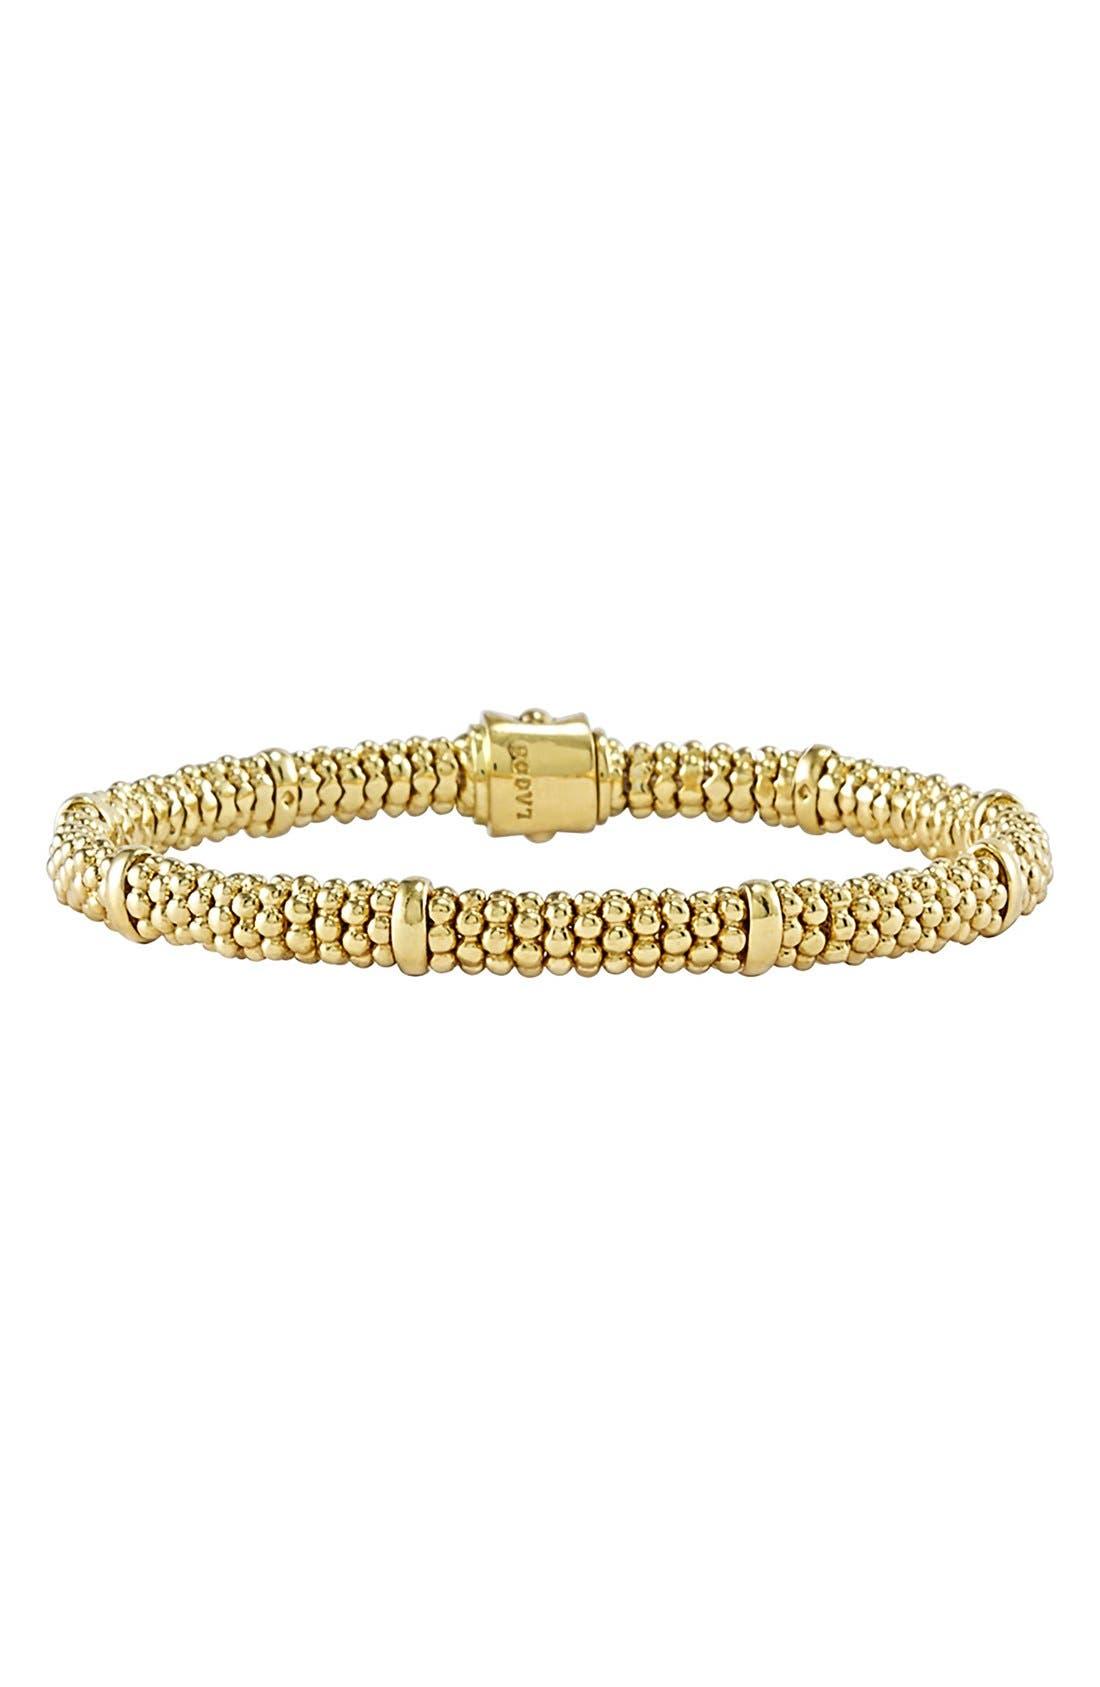 Caviar Rope Bracelet,                             Main thumbnail 1, color,                             GOLD